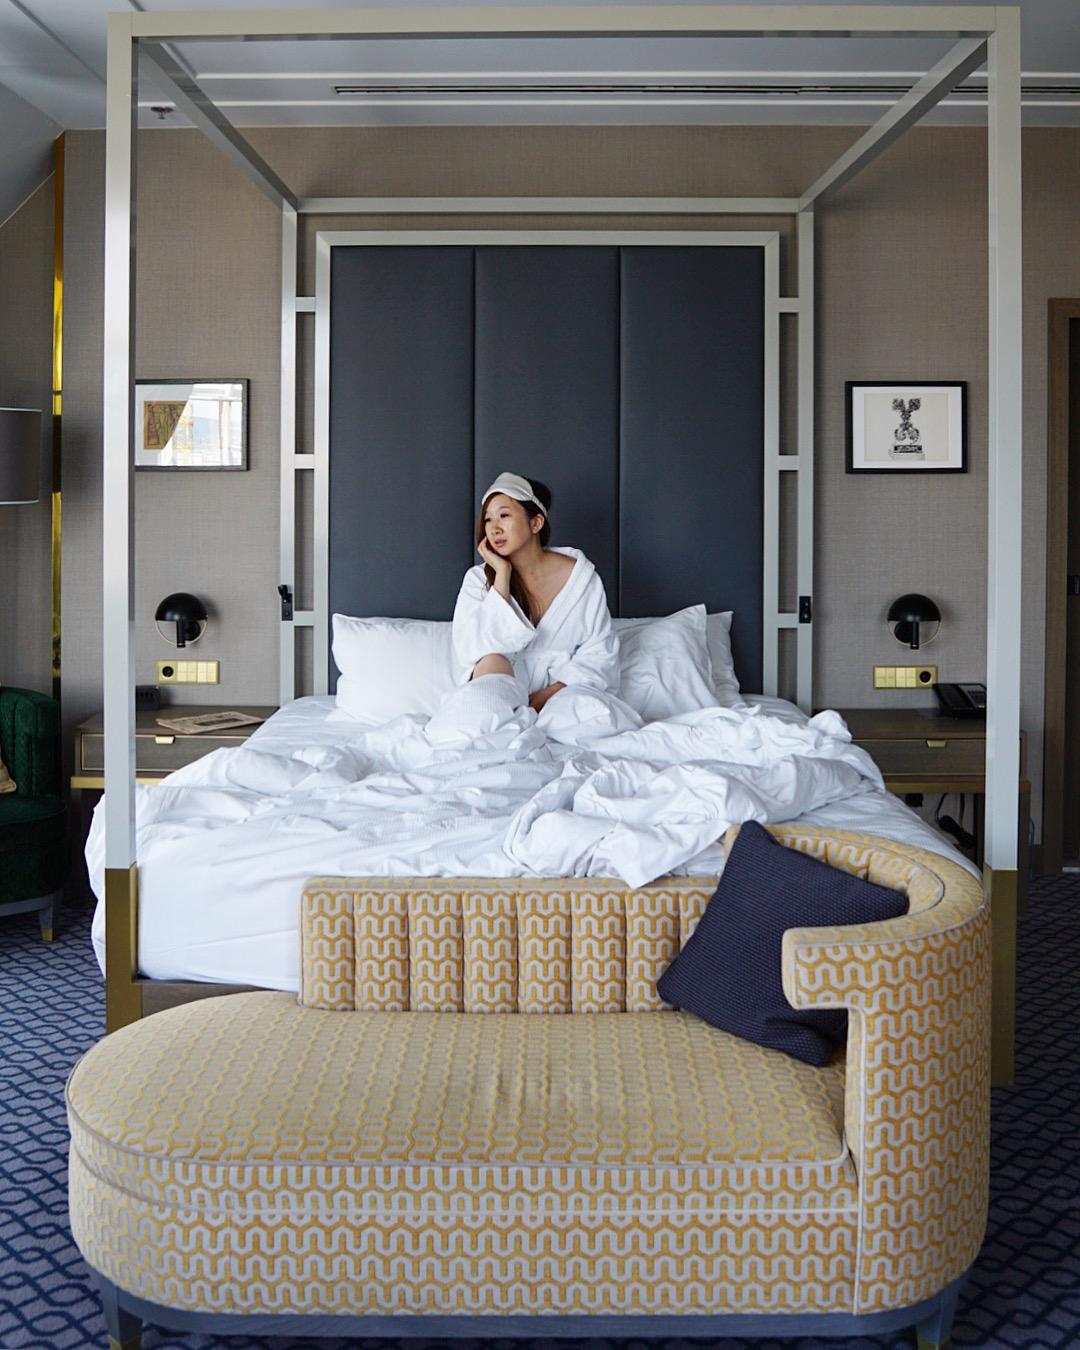 Enjoying the comfort of the bed in Hilton Vienna Plaza's Junior corner suite.